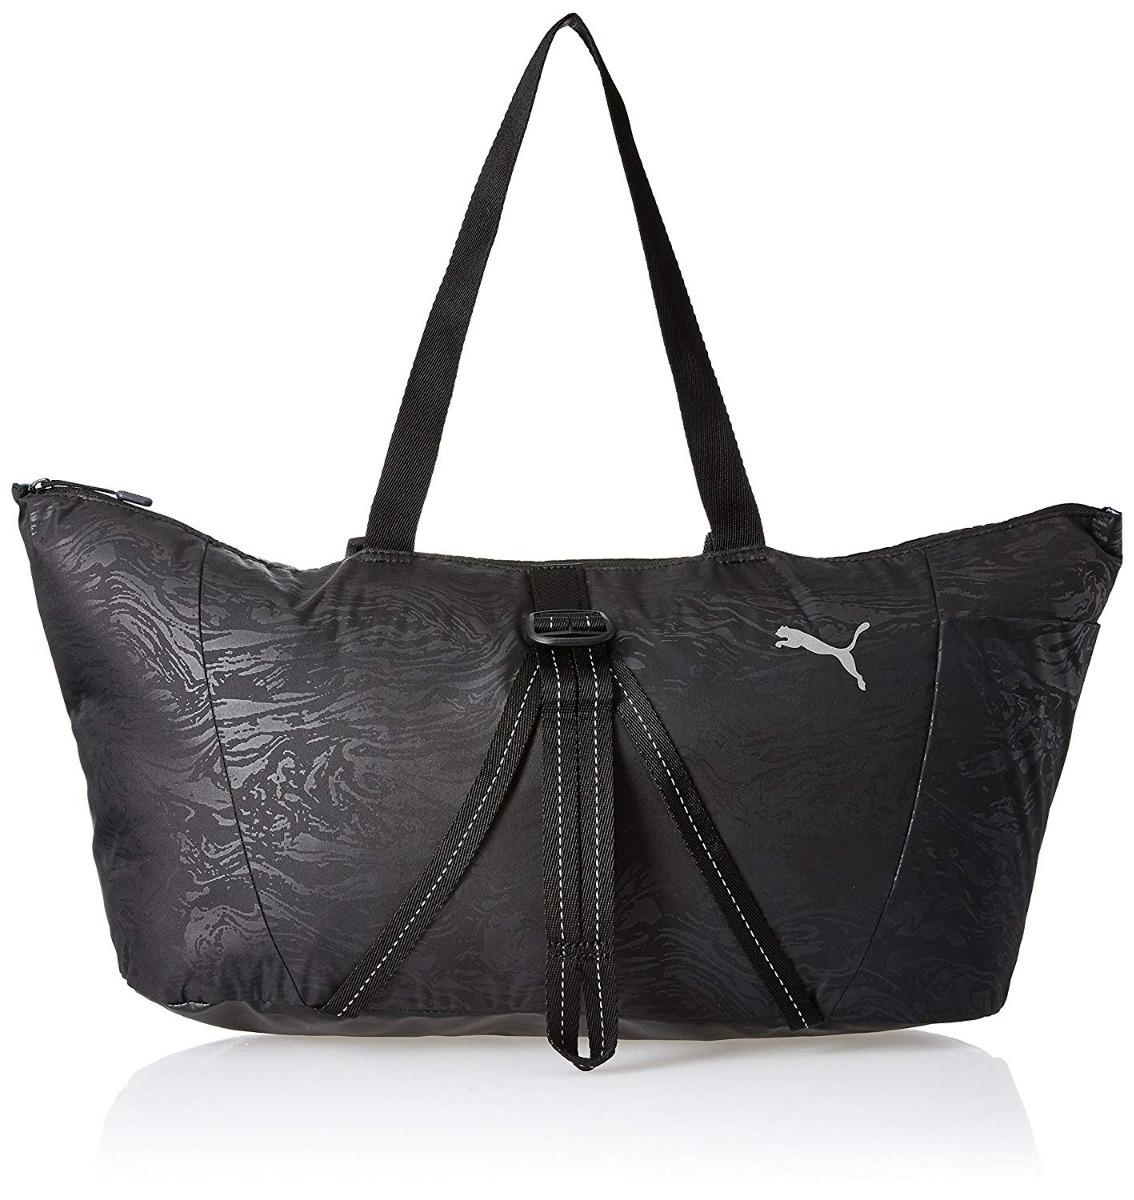 d4b8af44b8716 bolso deportivo urbano puma de mujer fit at sports original. Cargando zoom.